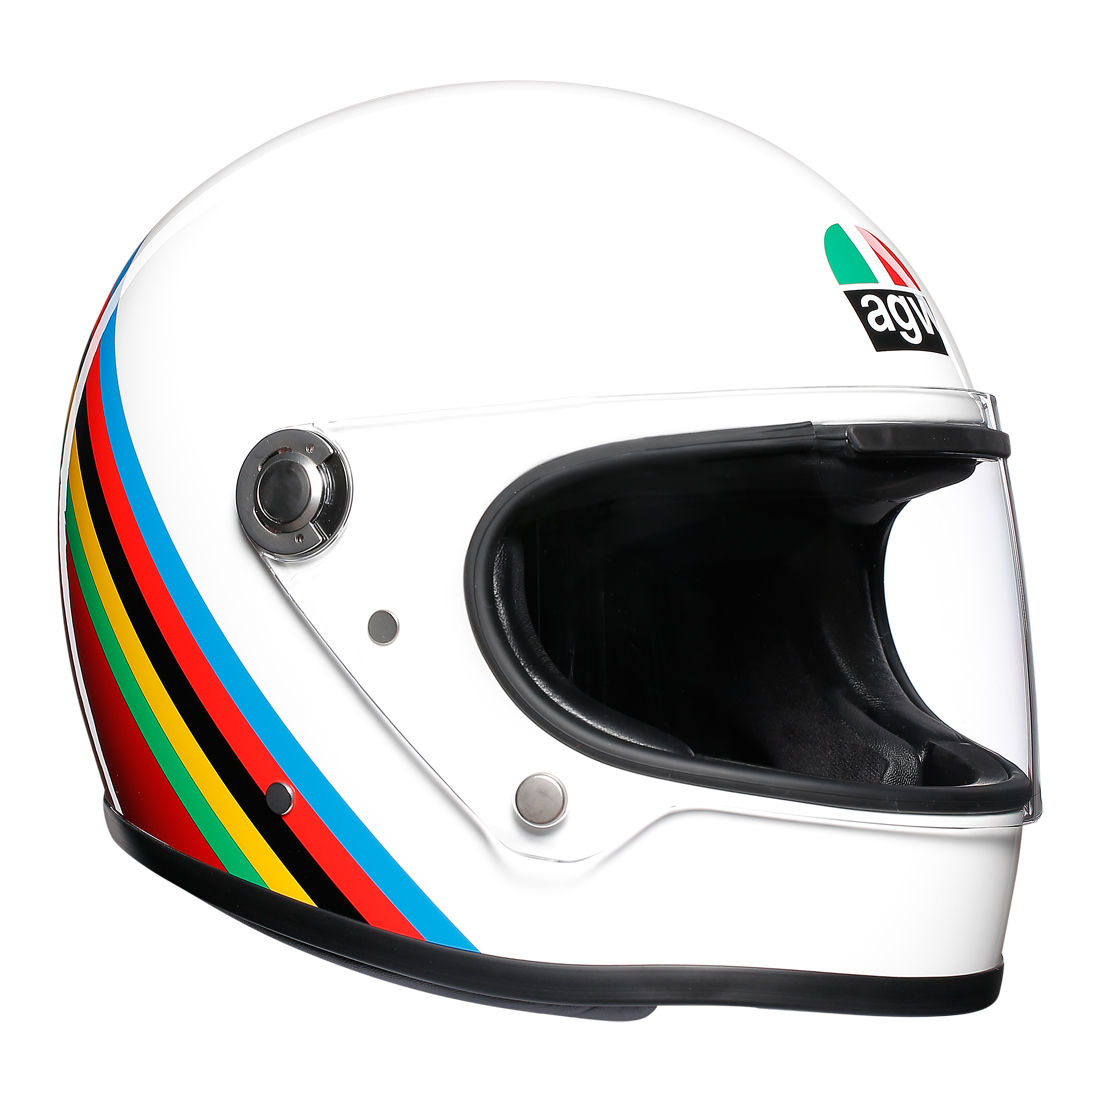 AGV(エージーブイ) バイク用ヘルメット フルフェイス LEGENDS X3000 / GLORIA (グロリア) Mサイズ (57-58cm) 001192I0001-M